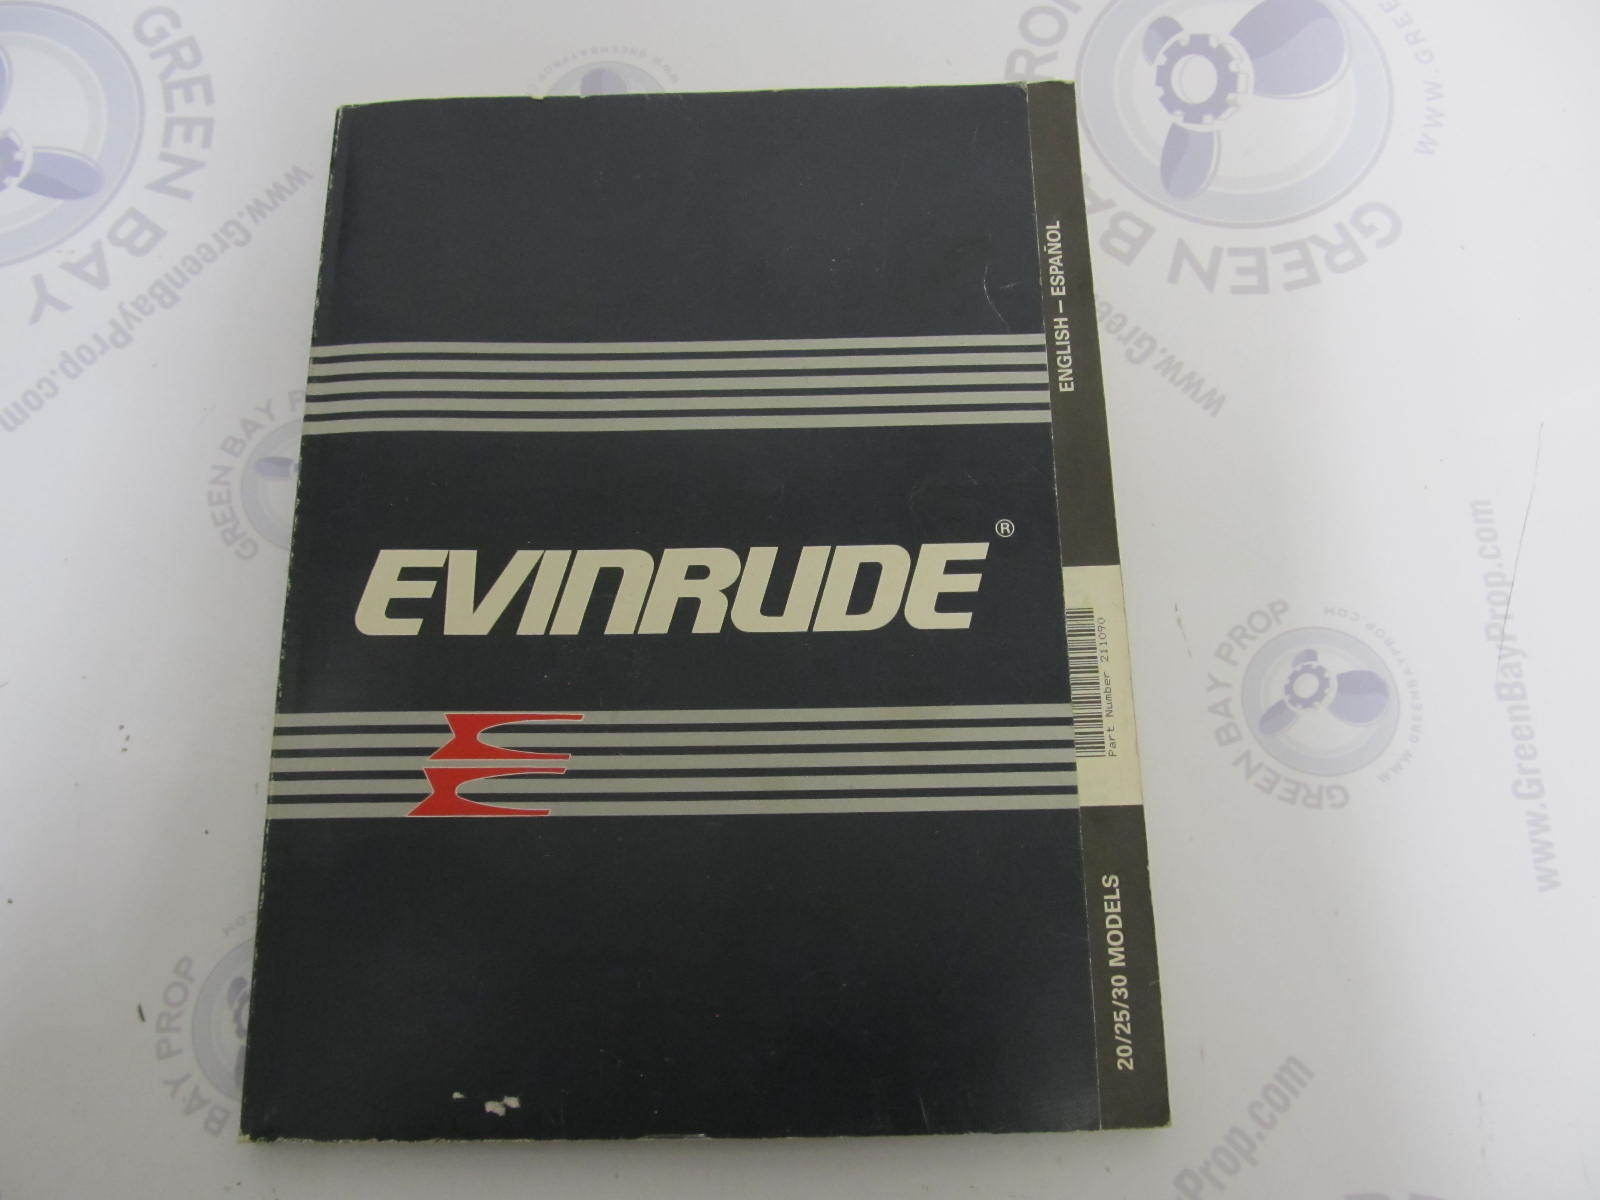 Evinrude 30 Hp 1988 manual